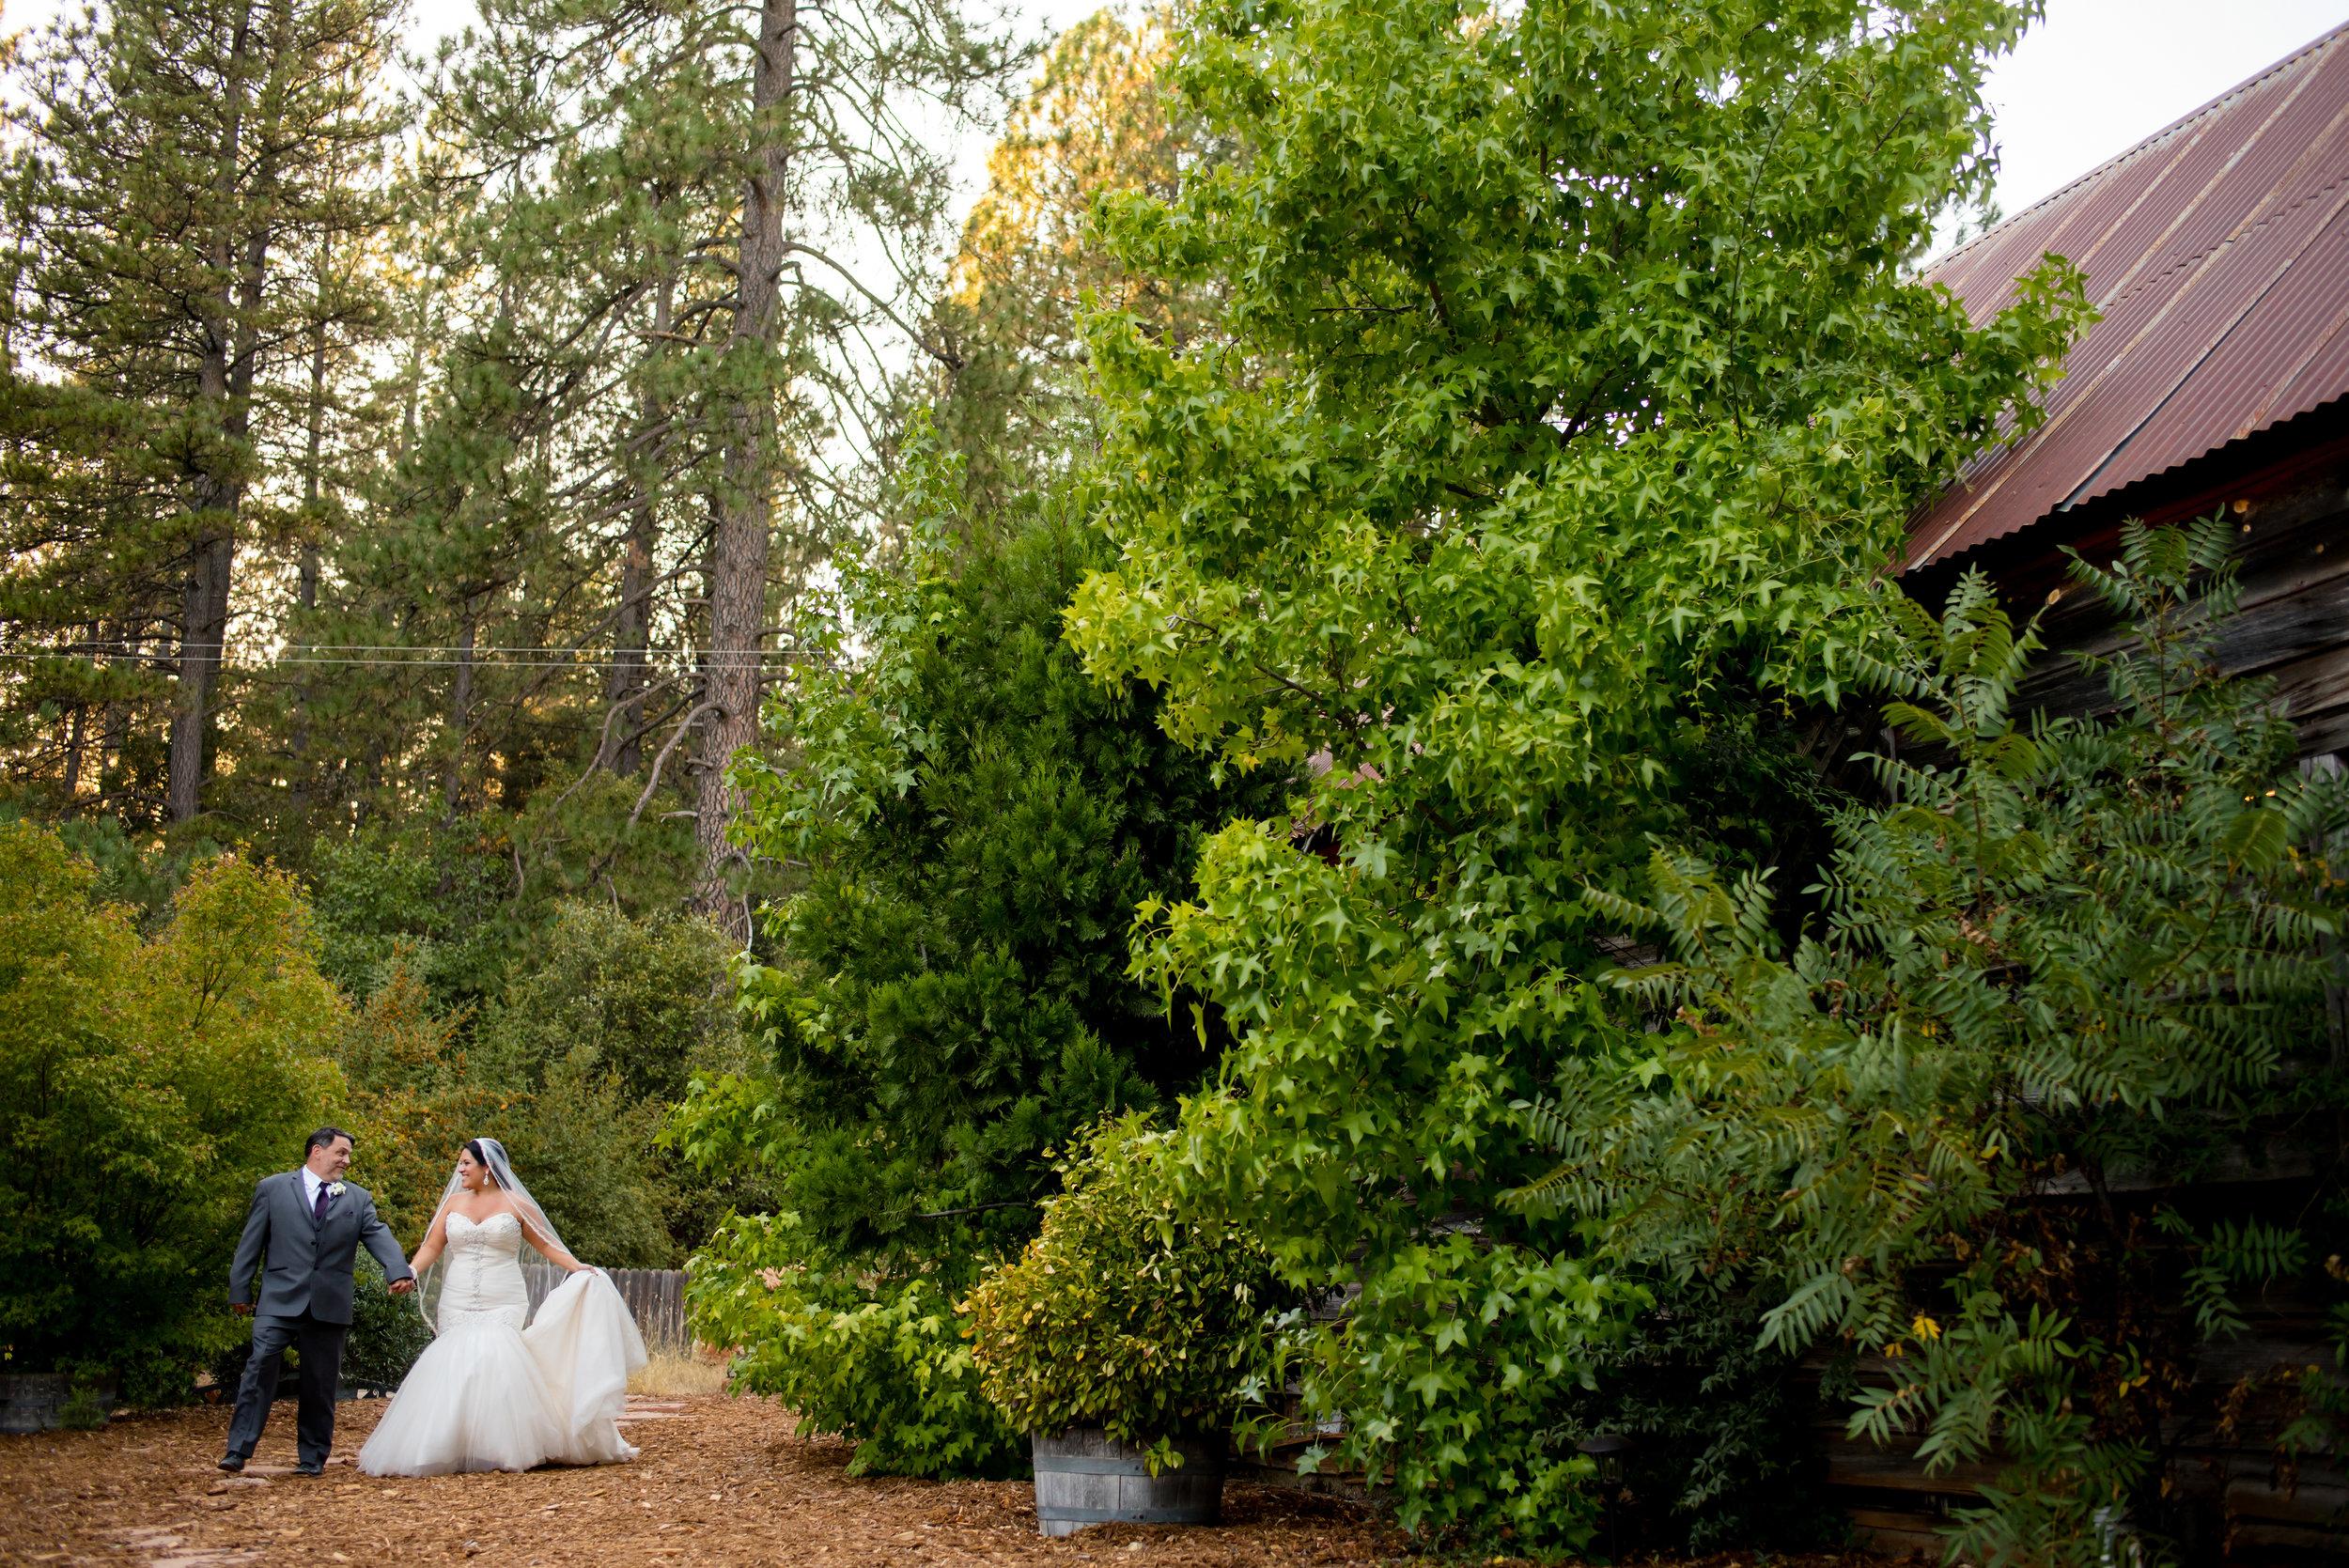 erika-seth-029-monte-verde-inn-sacramento-wedding-photographer-katherine-nicole-photography.JPG